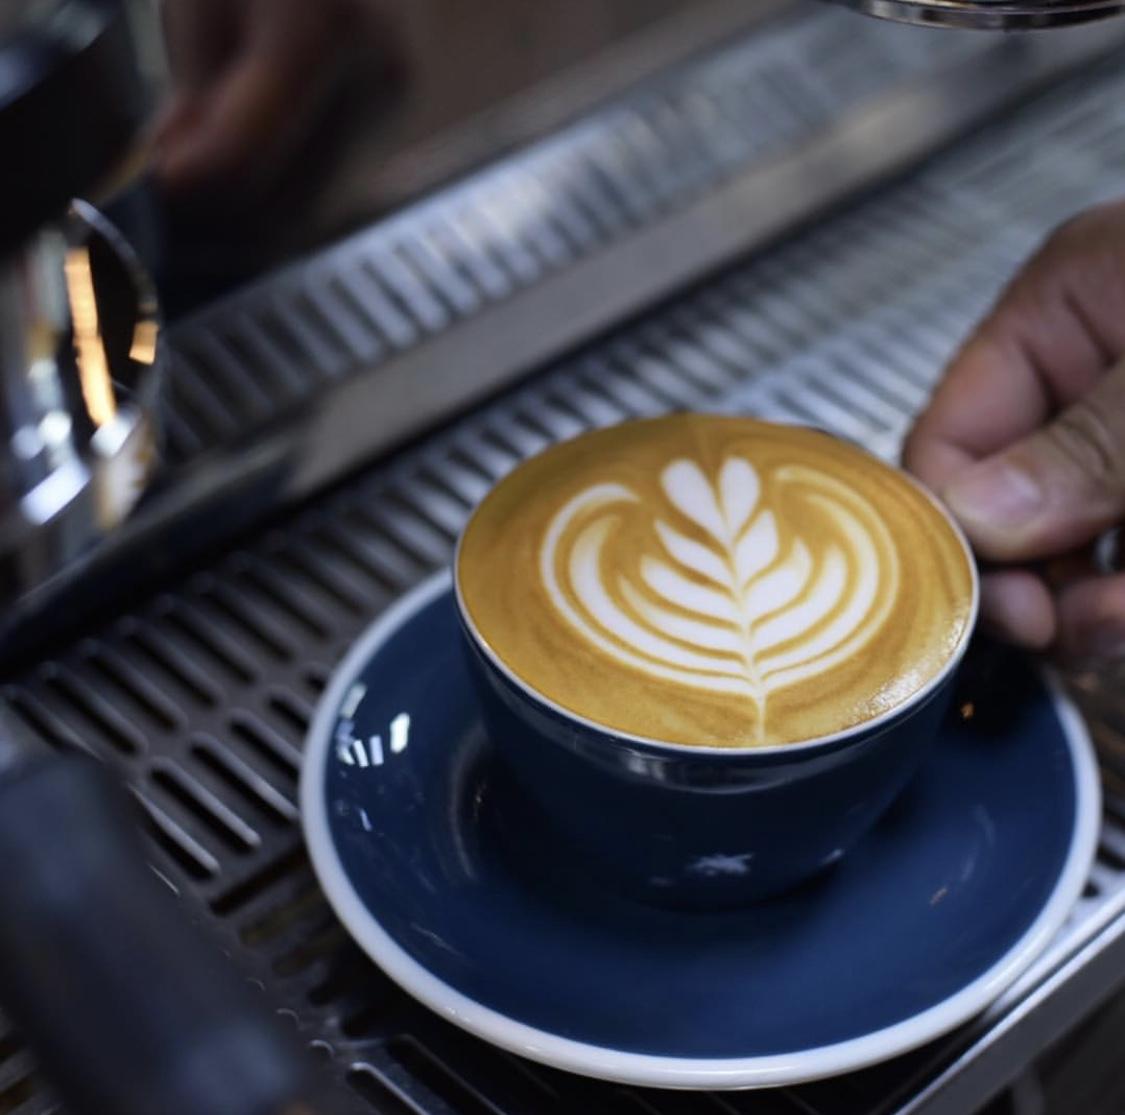 Good Karma fresh coffee coffee - Cappuccino, latte, flat white, mocha